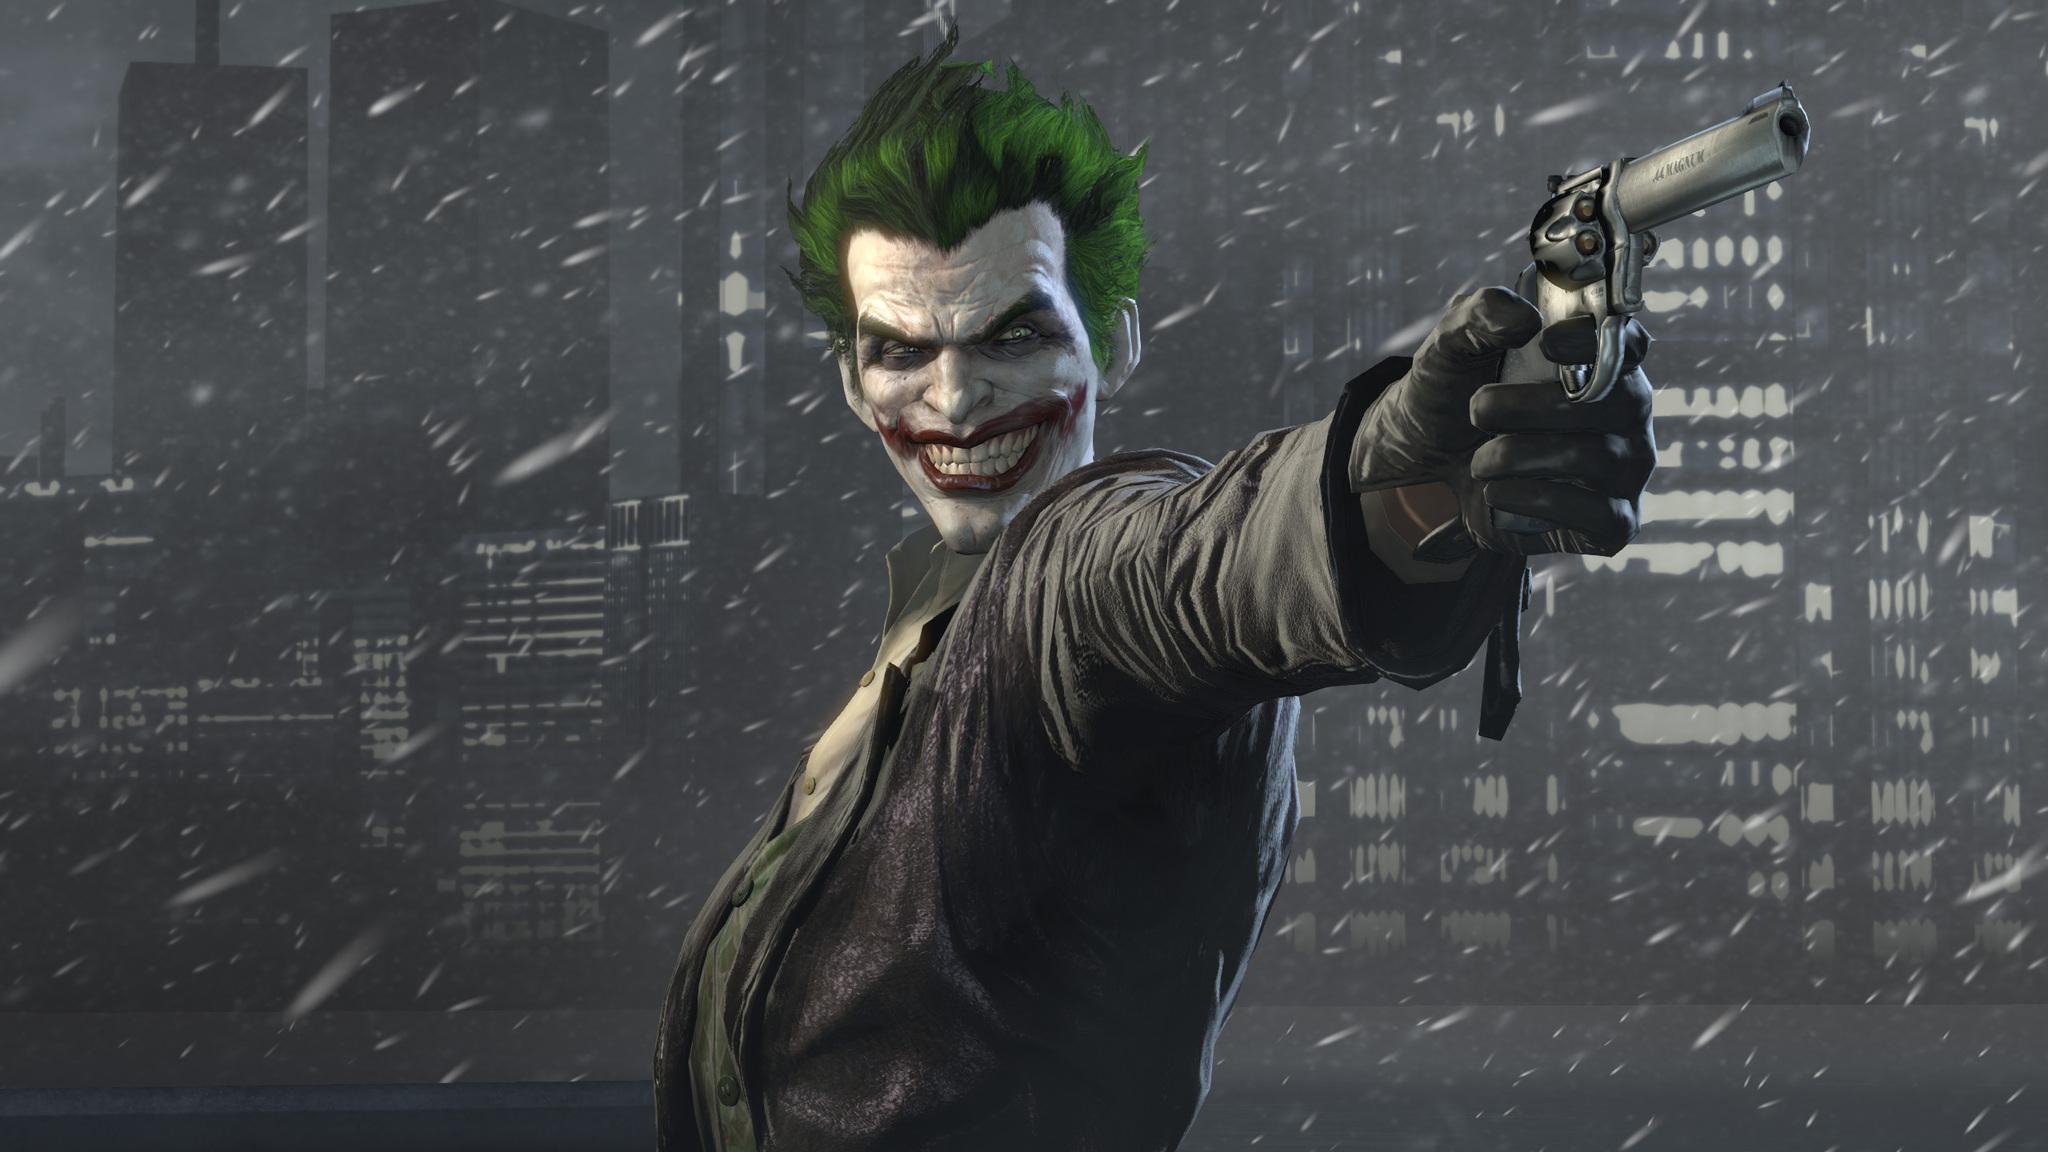 2048x1152 joker batman arkham origins 2048x1152 resolution hd 4k joker batman arkham origins rjg voltagebd Images